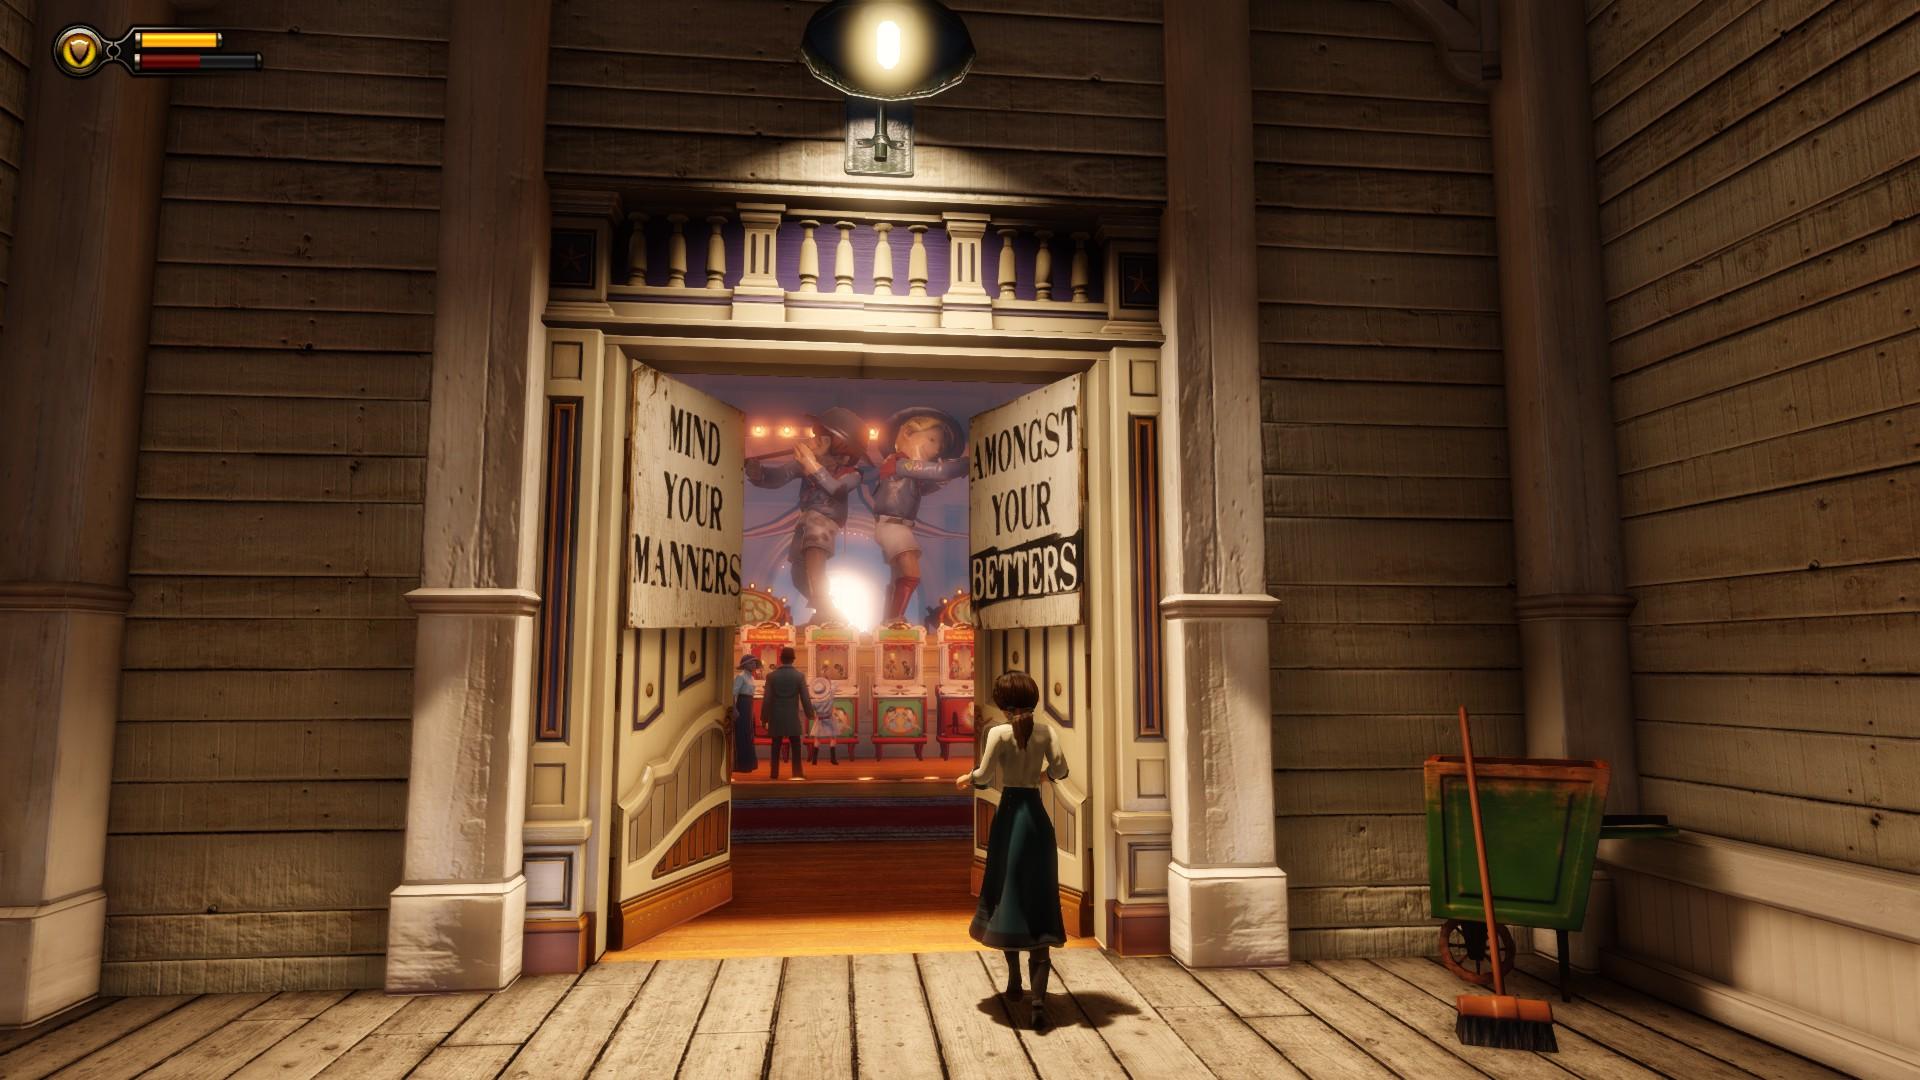 Welcome to Disneyworld!